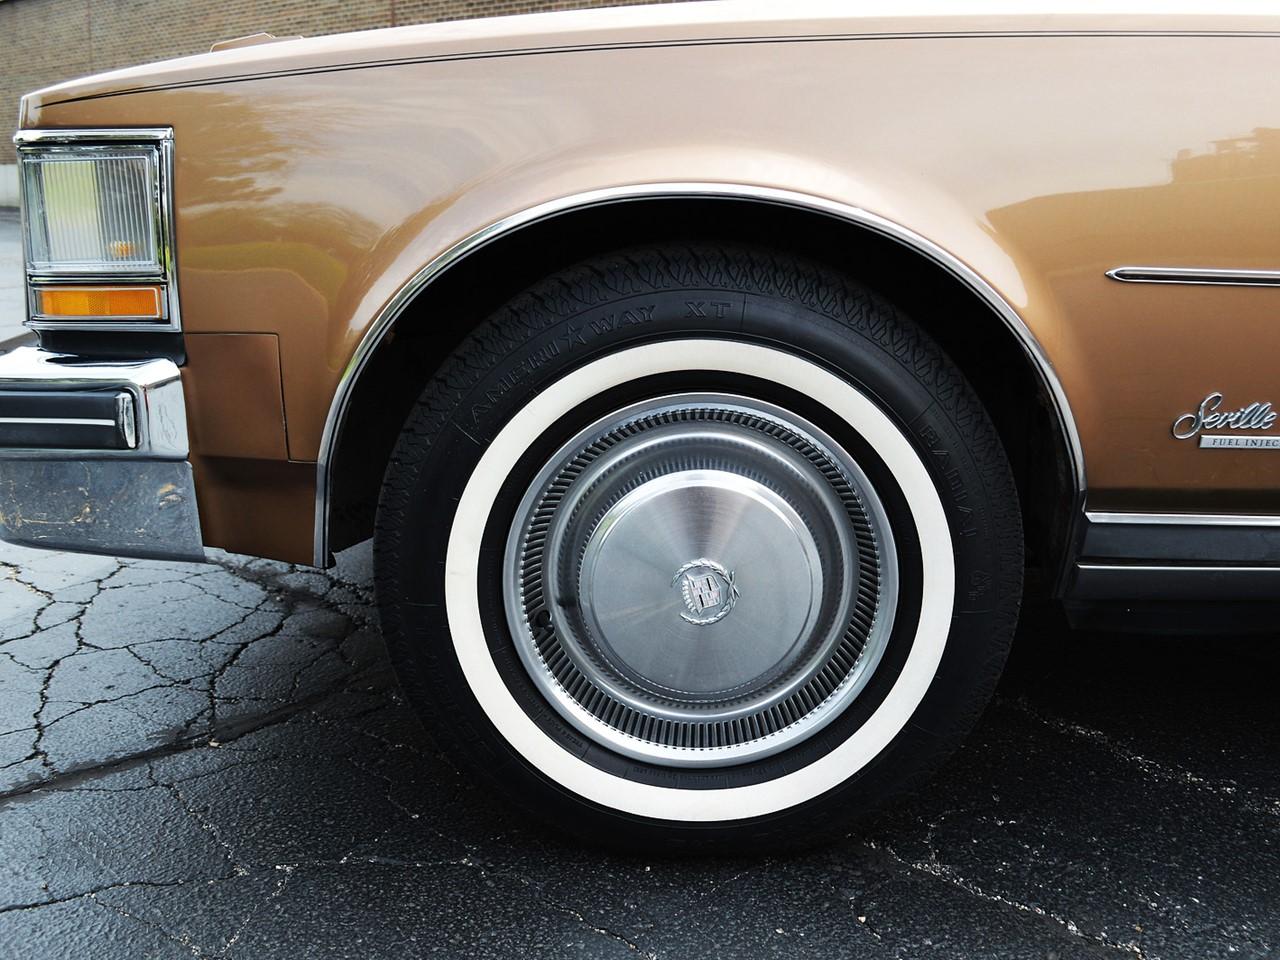 1976 Cadillac Seville 16